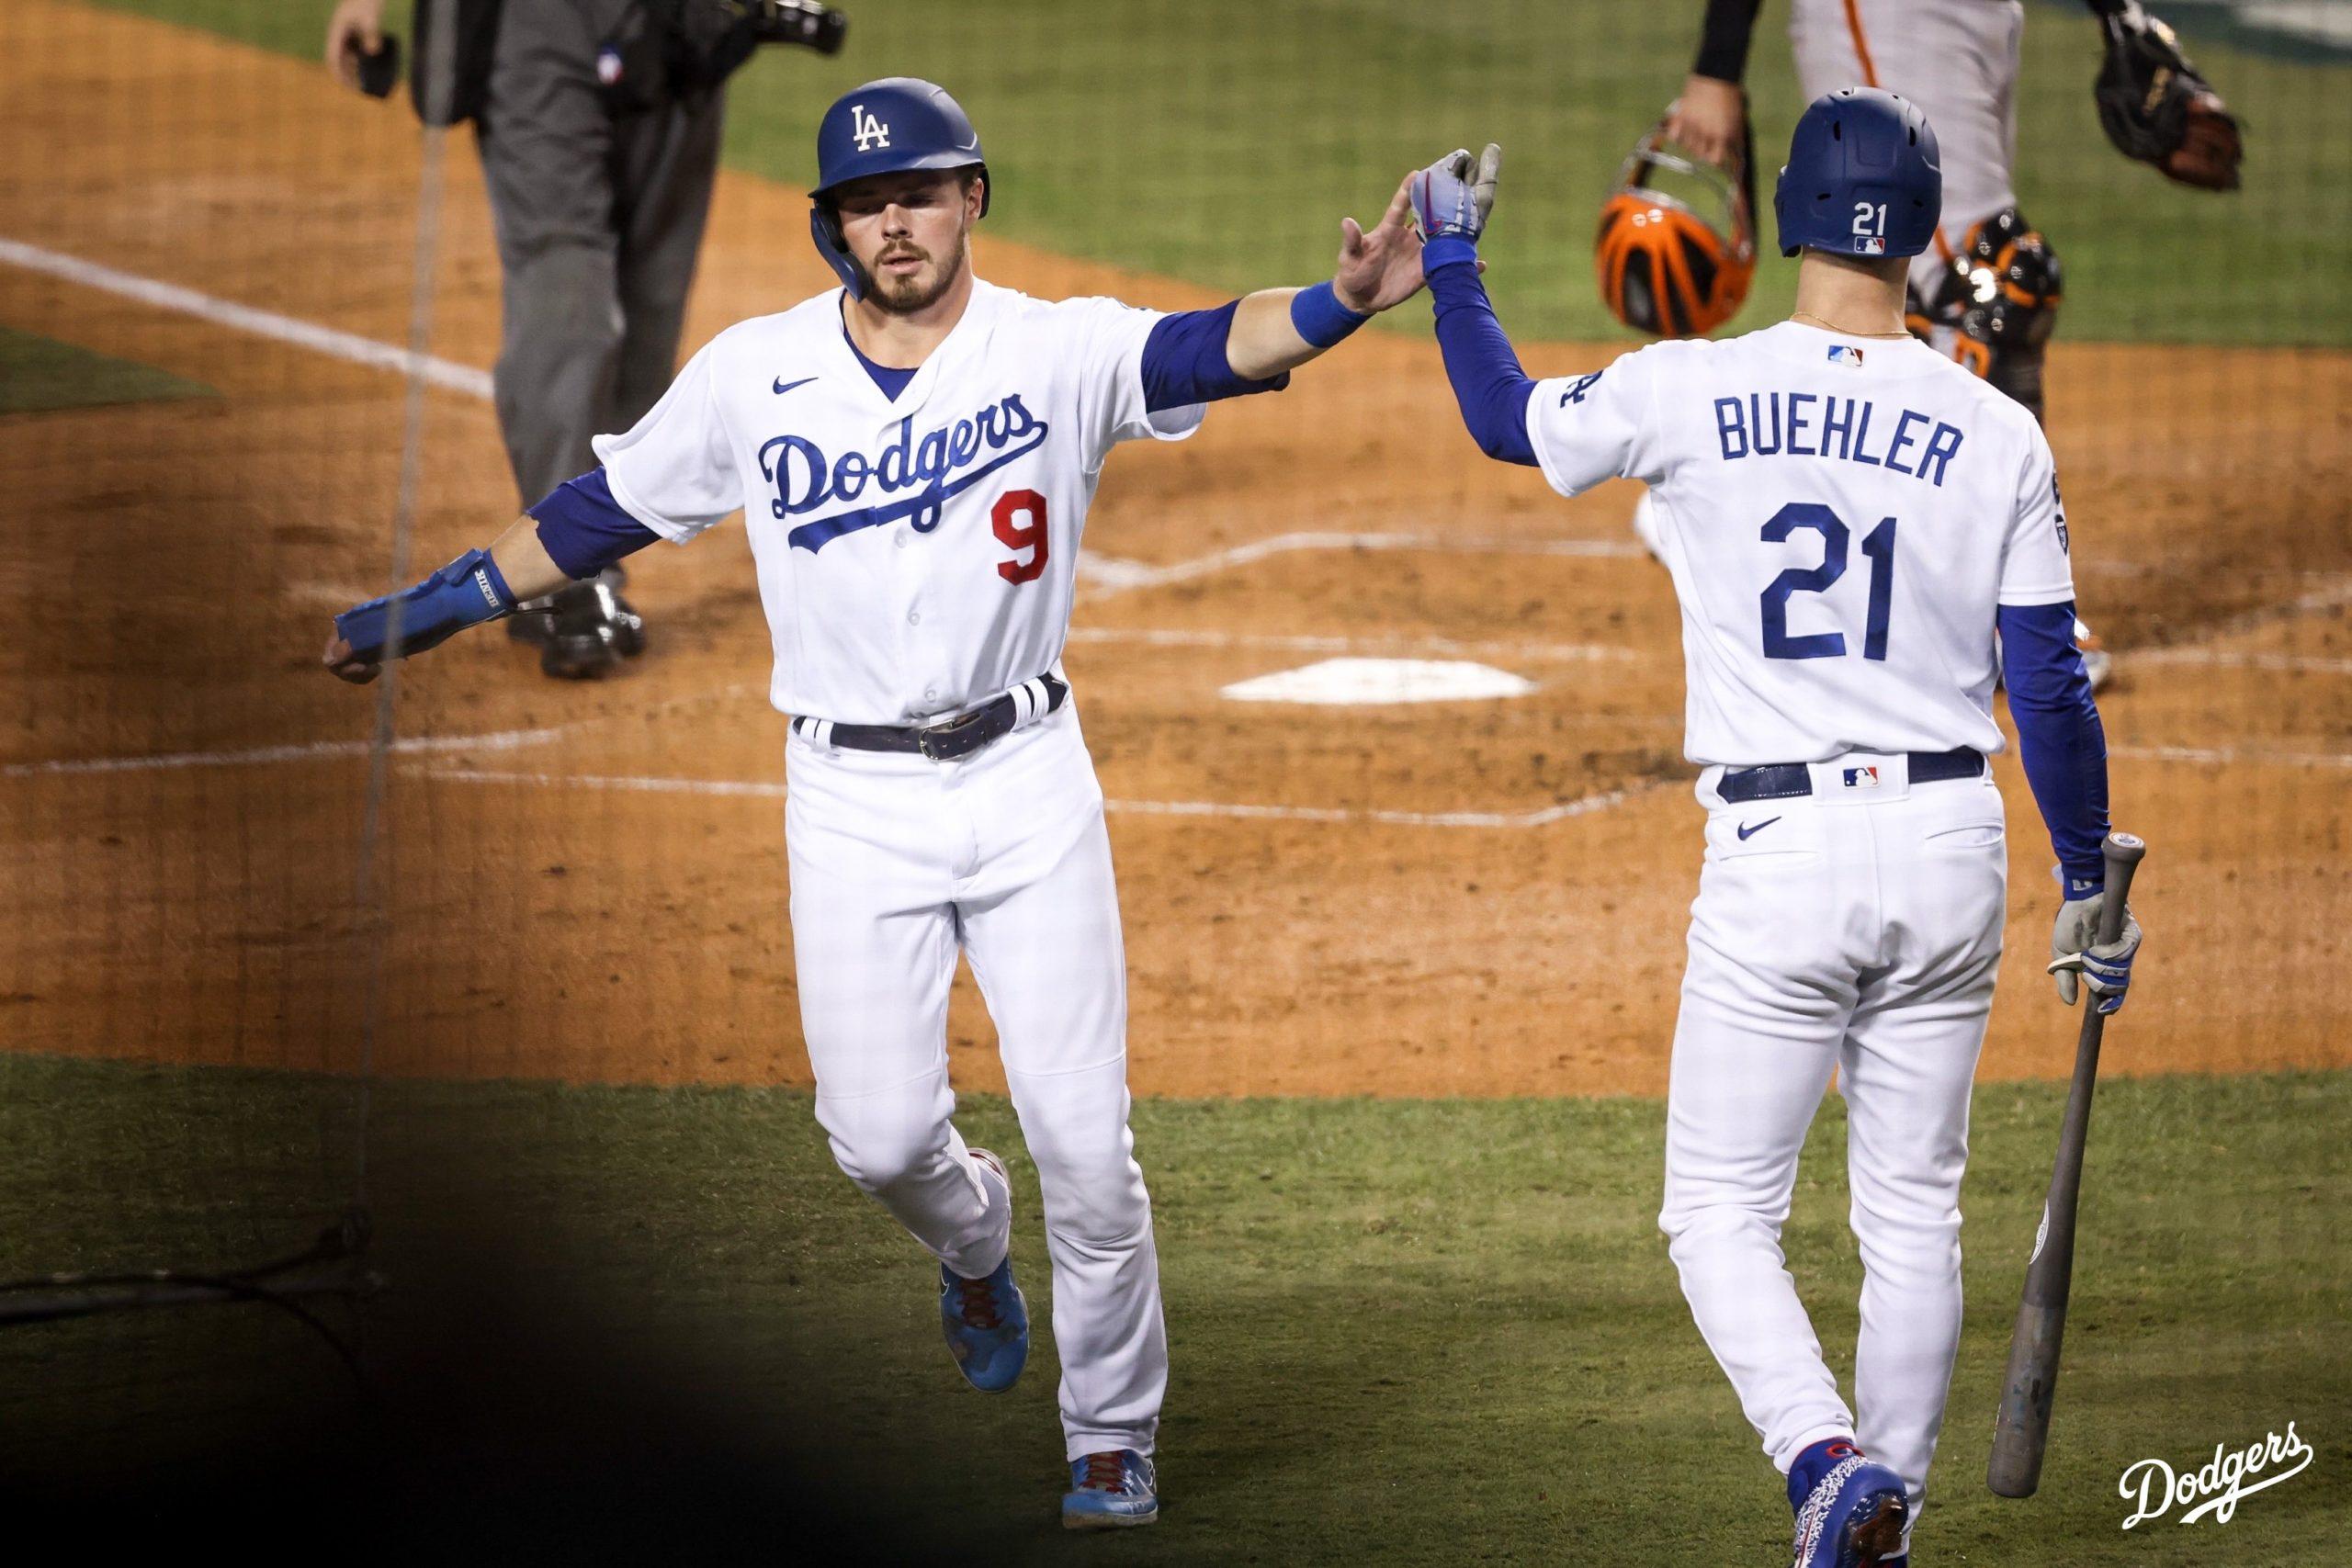 Dodgers